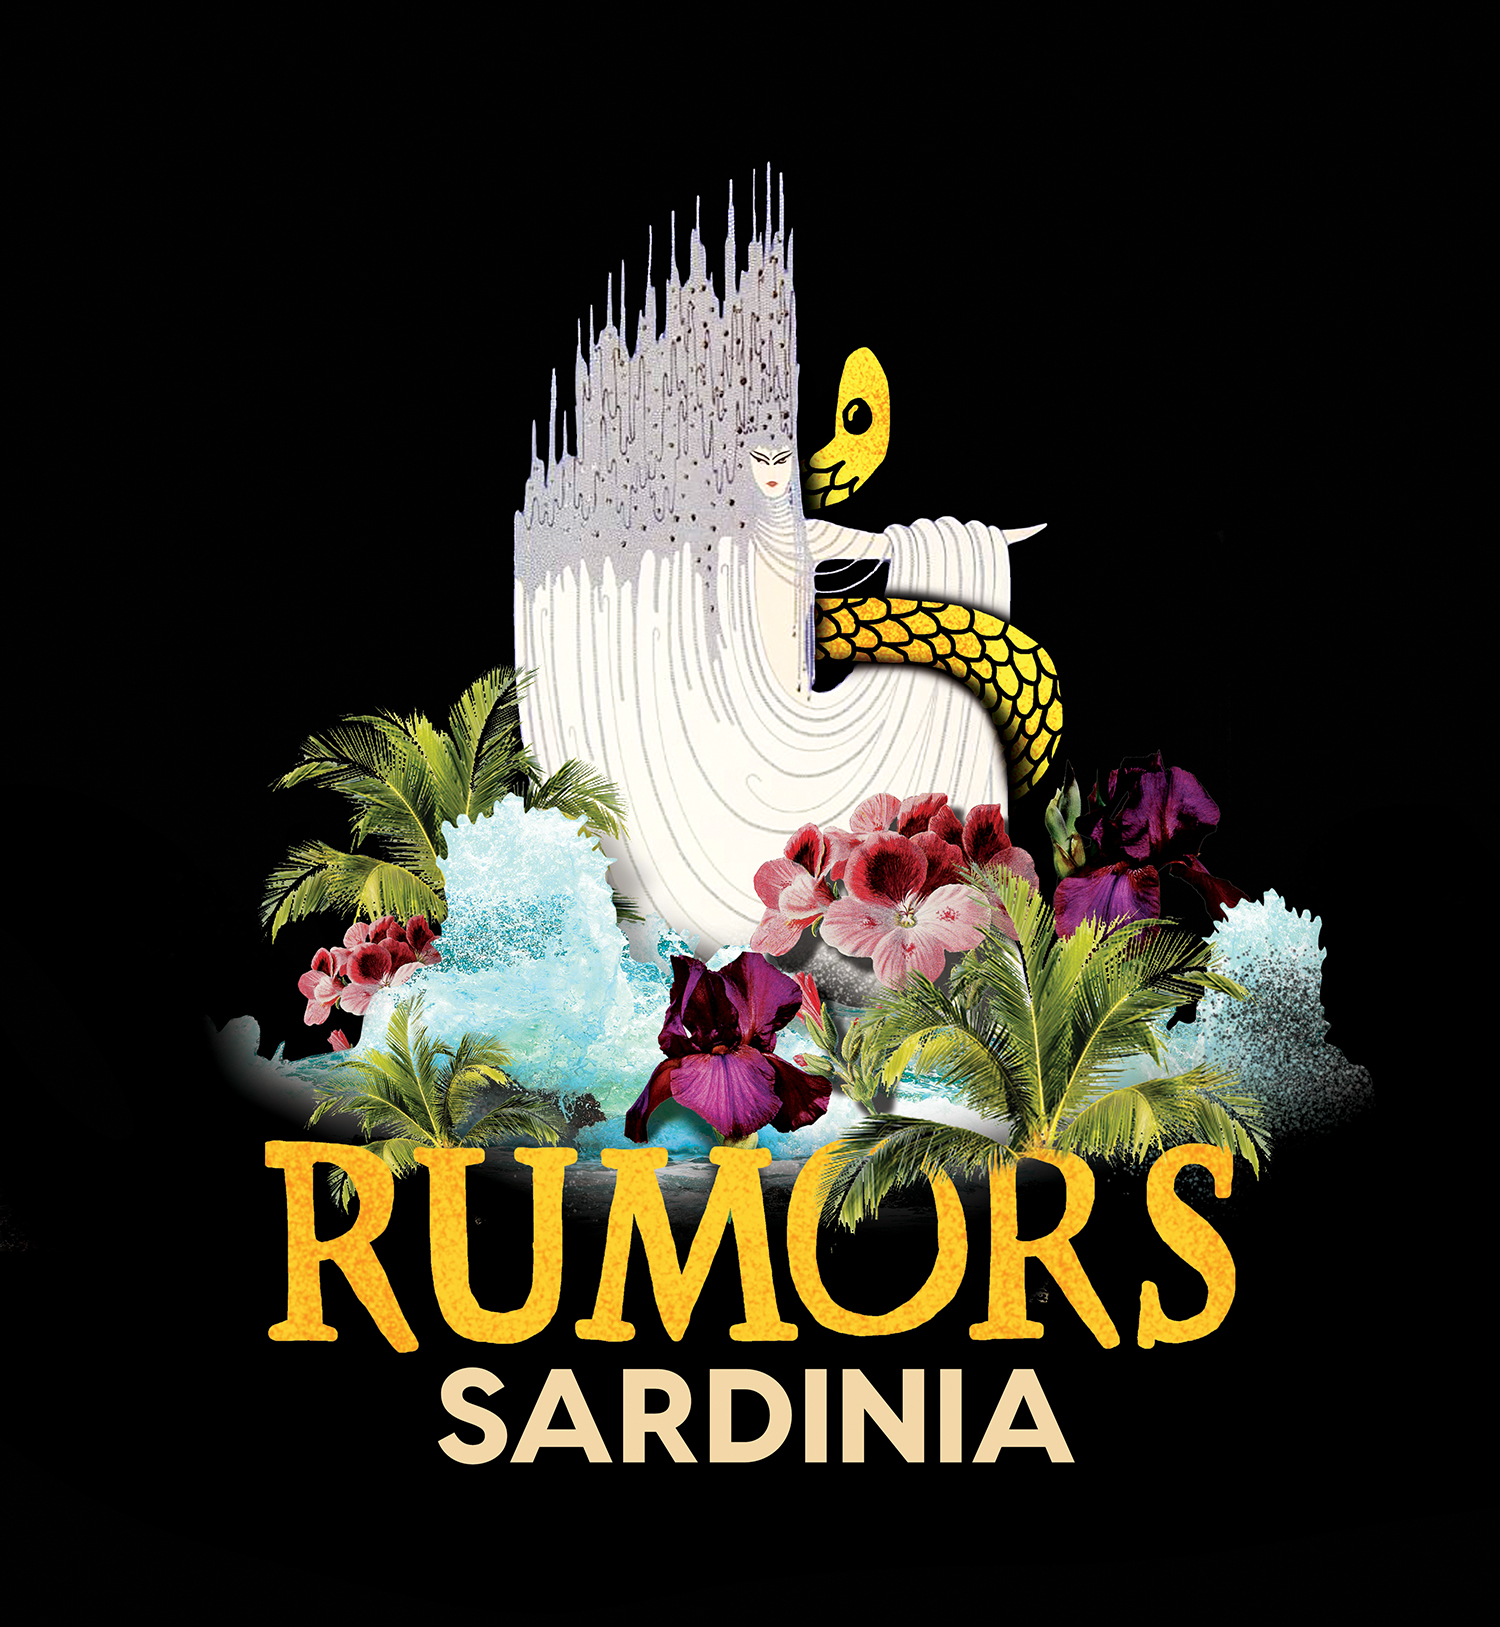 Rumors-Sardinia-'17.jpg